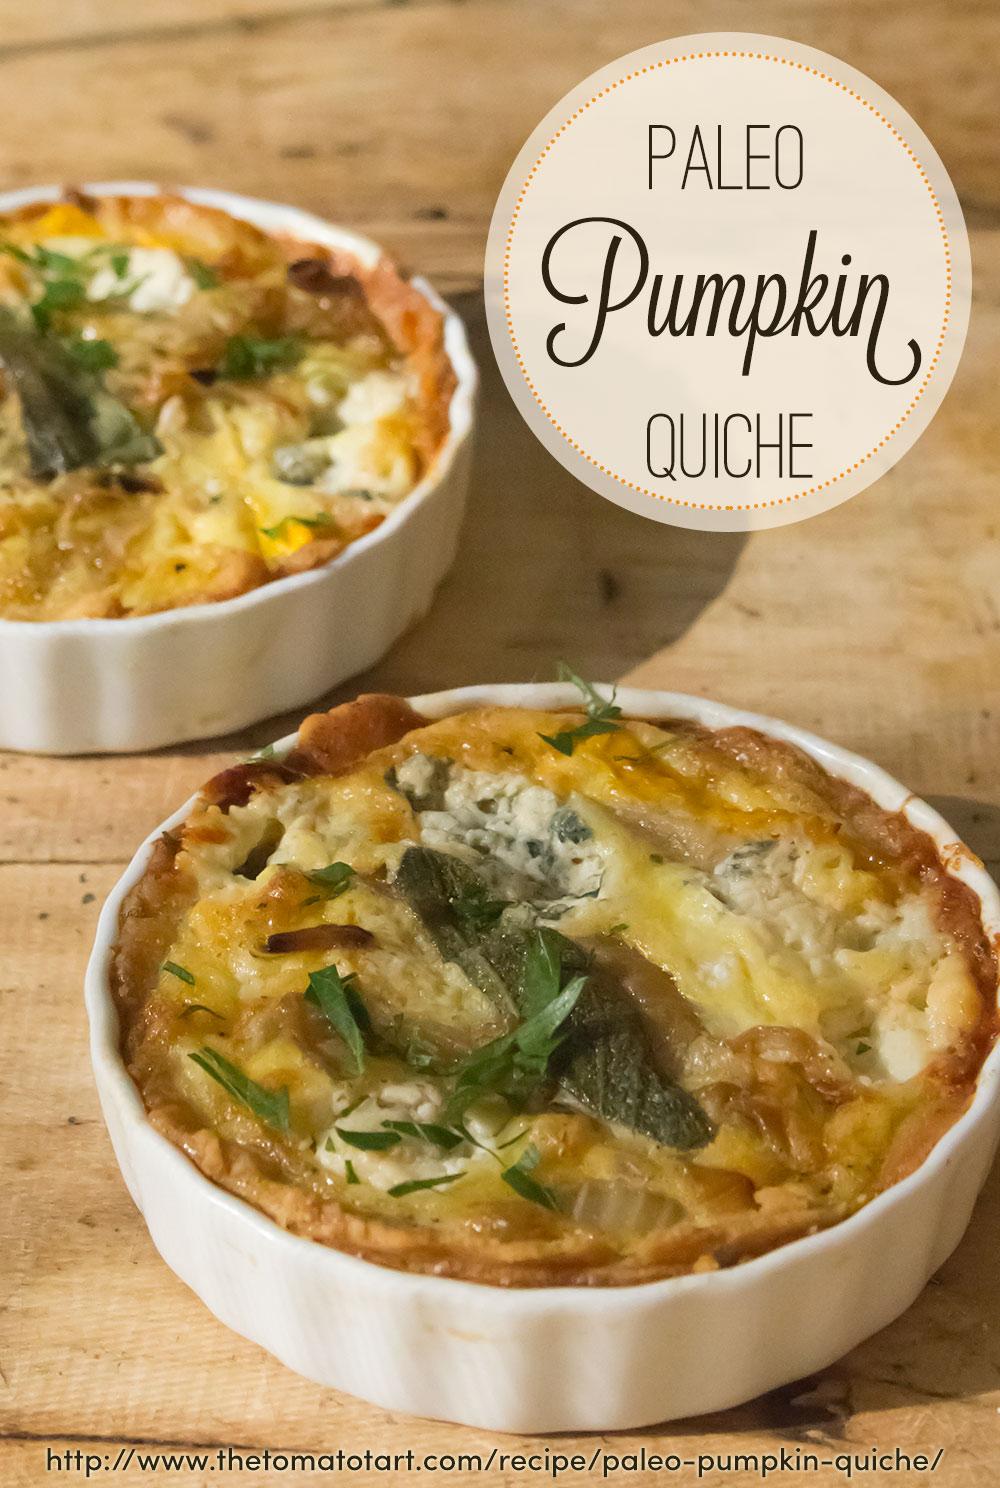 Paleo Pumpkin Quiche A Gluten Free Grain Free Quiche Of